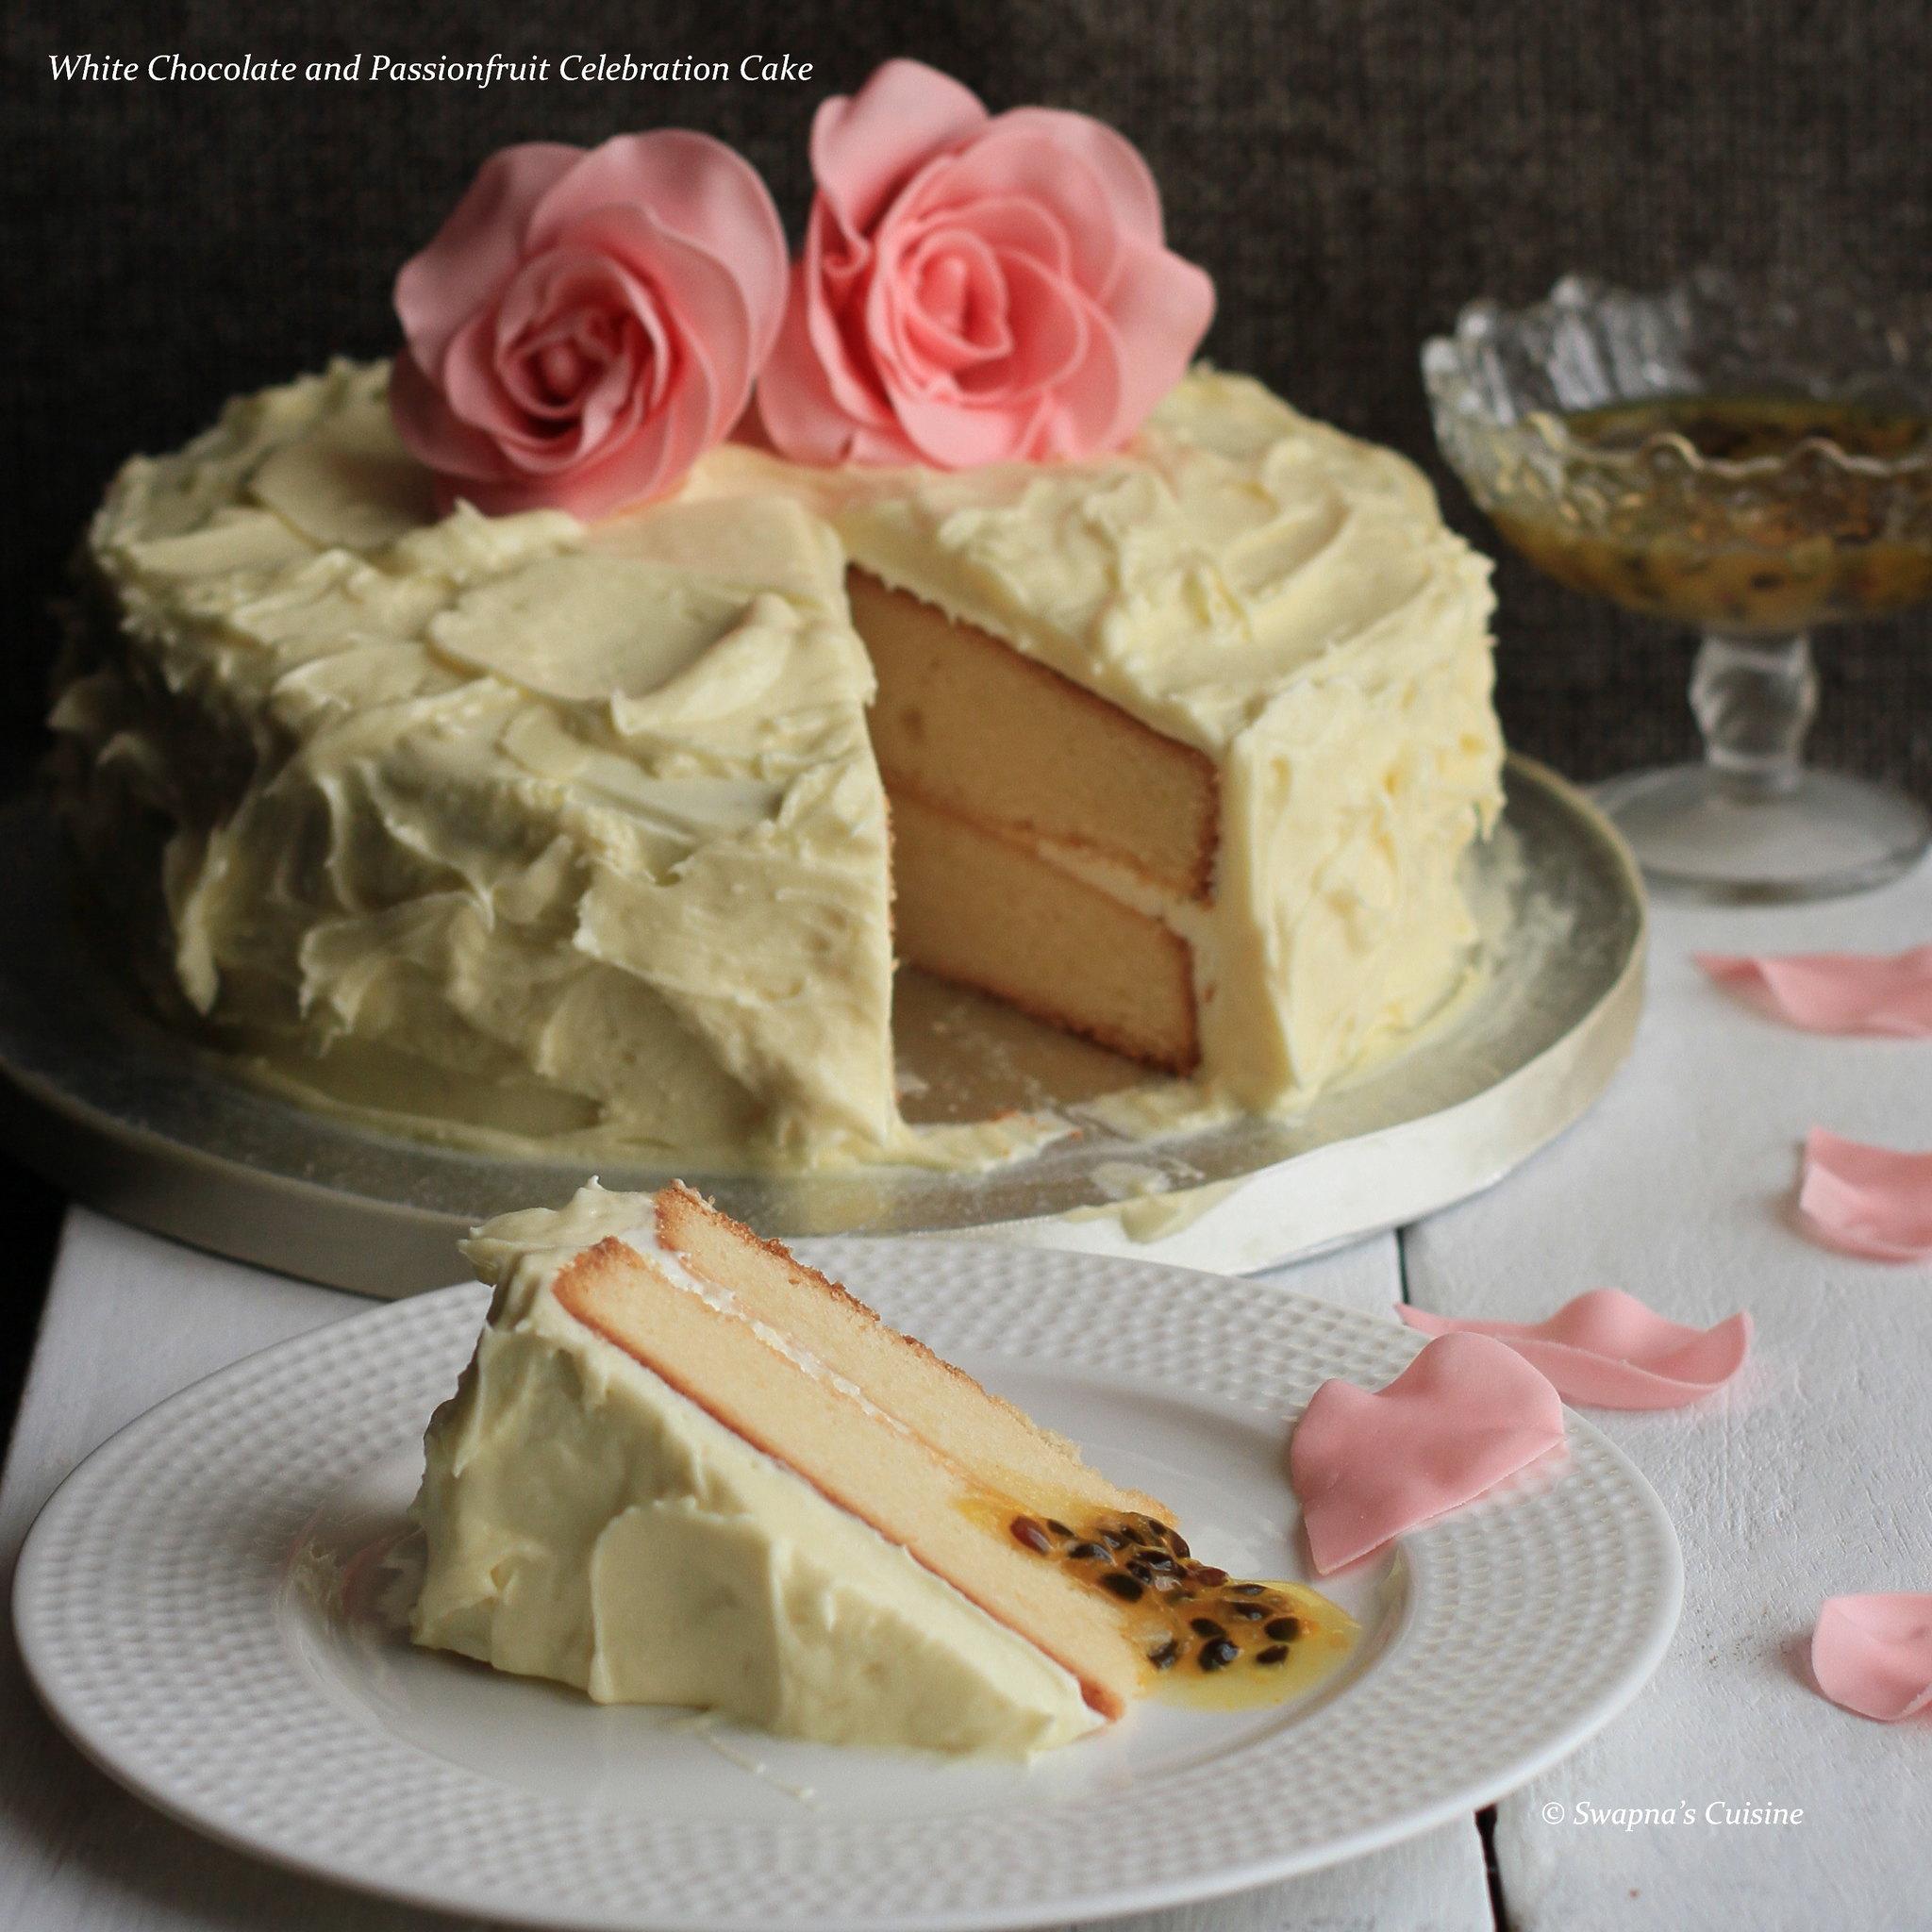 Celebration Cake Recipes: Swapna's Cuisine: White Chocolate And Passionfruit